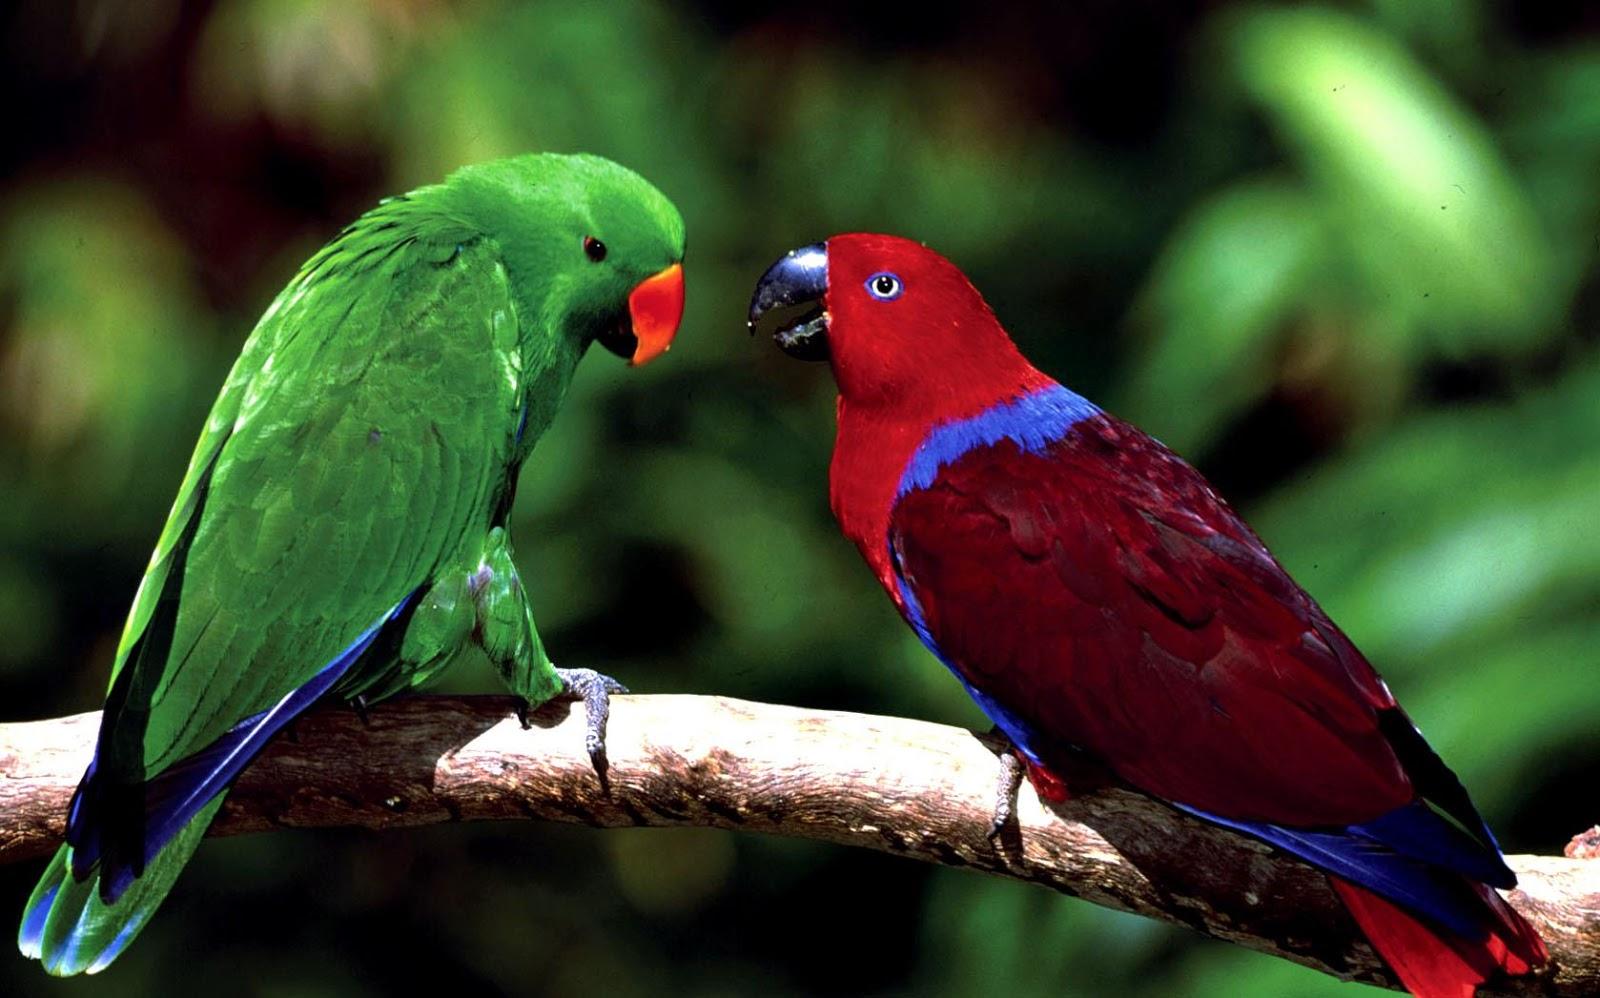 parrots wallpaper bird - photo #23